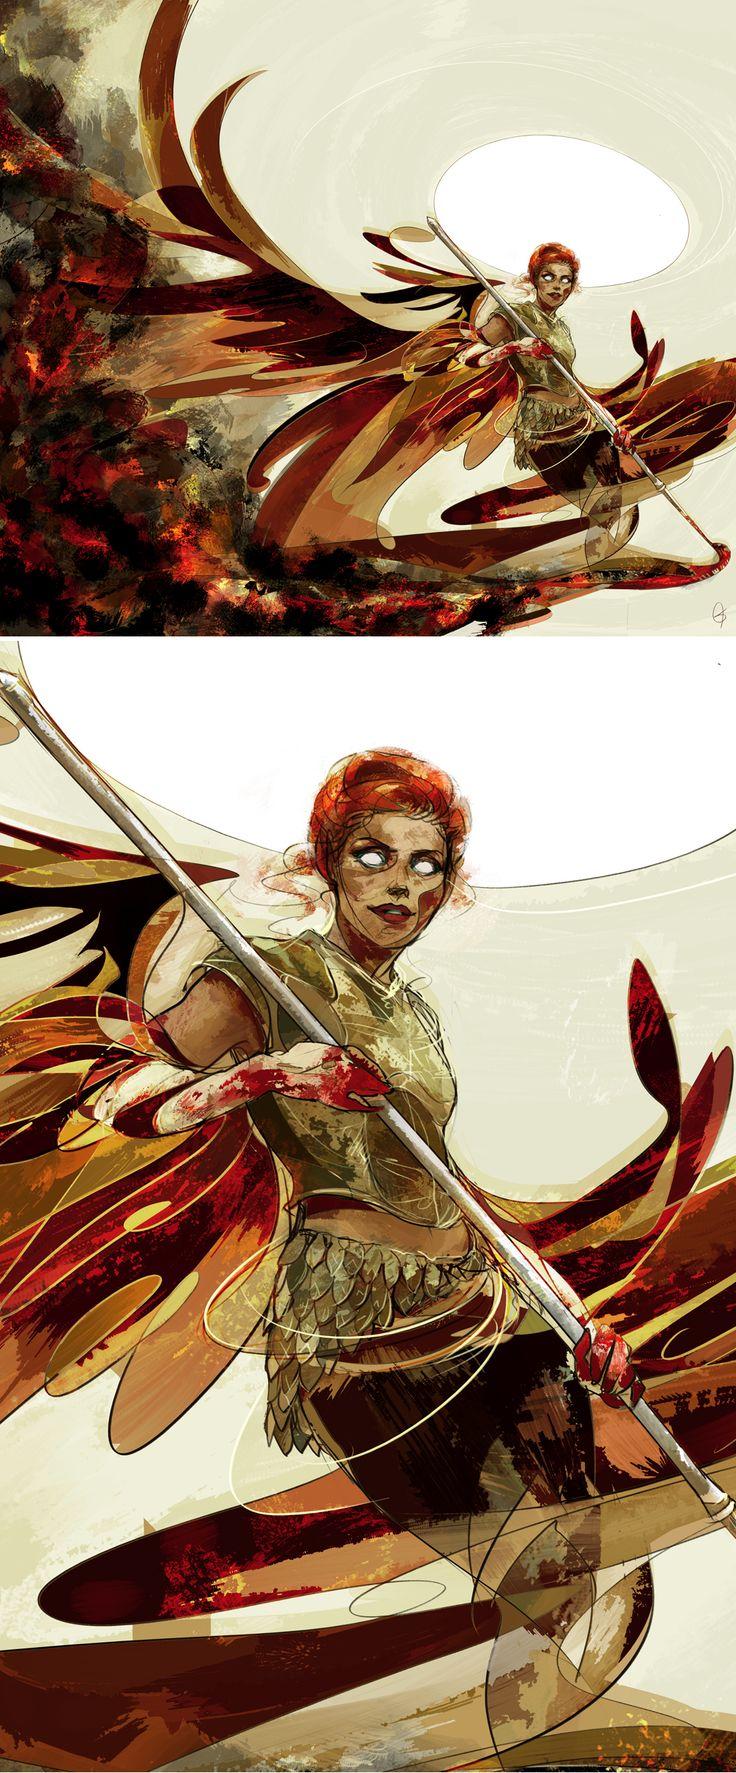 Abaddon an angel of destruction by anobviousaside #spn